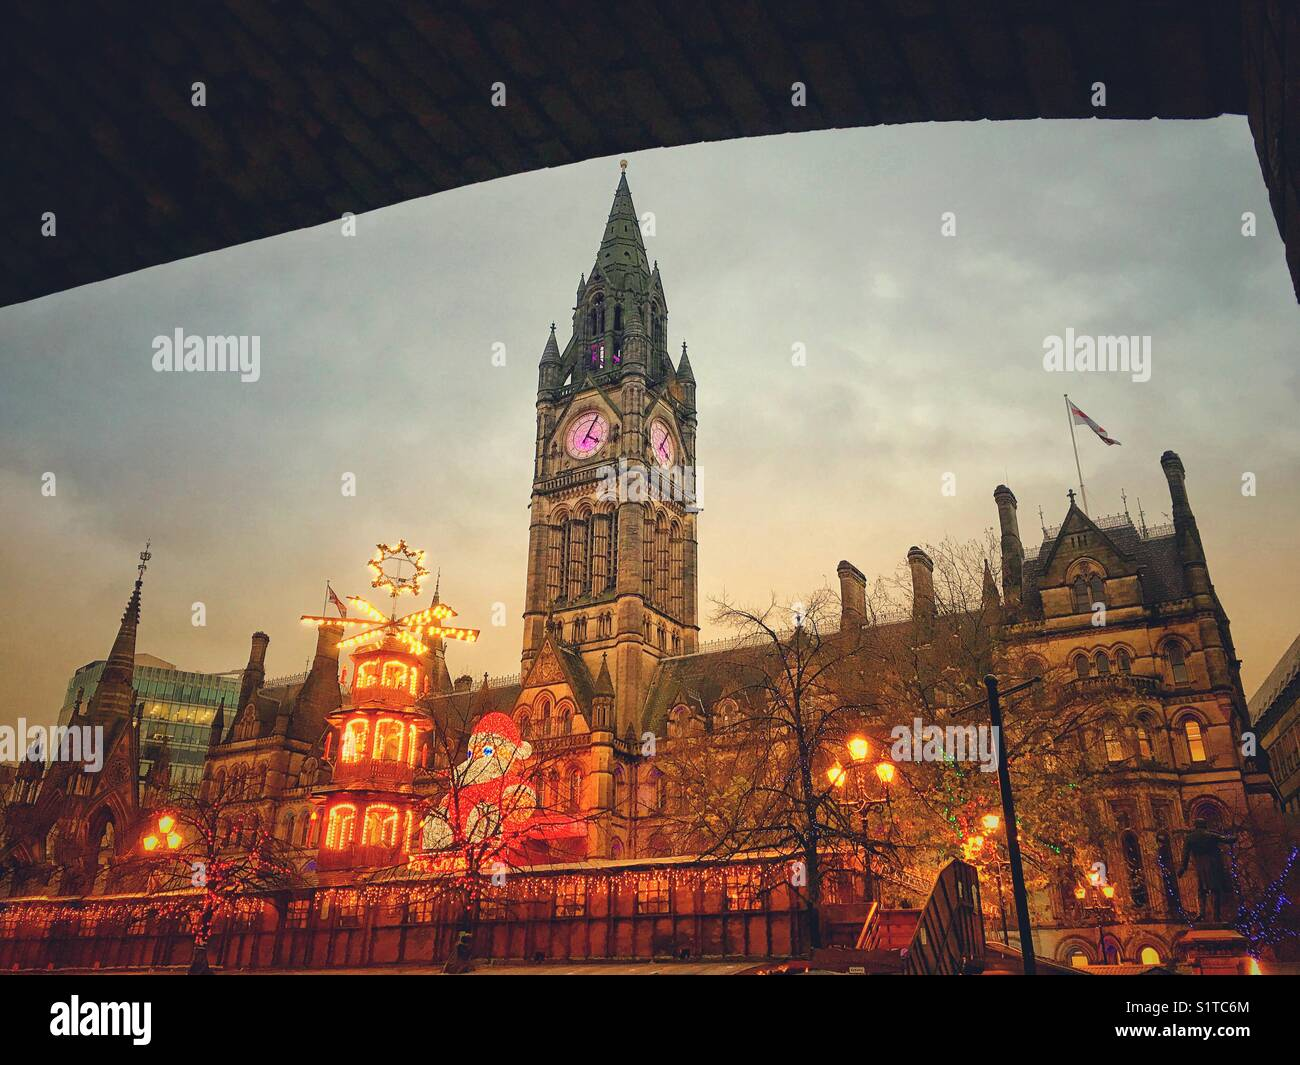 The Christmas Markets outside Albert Hall, Manchester, UK - Stock Image